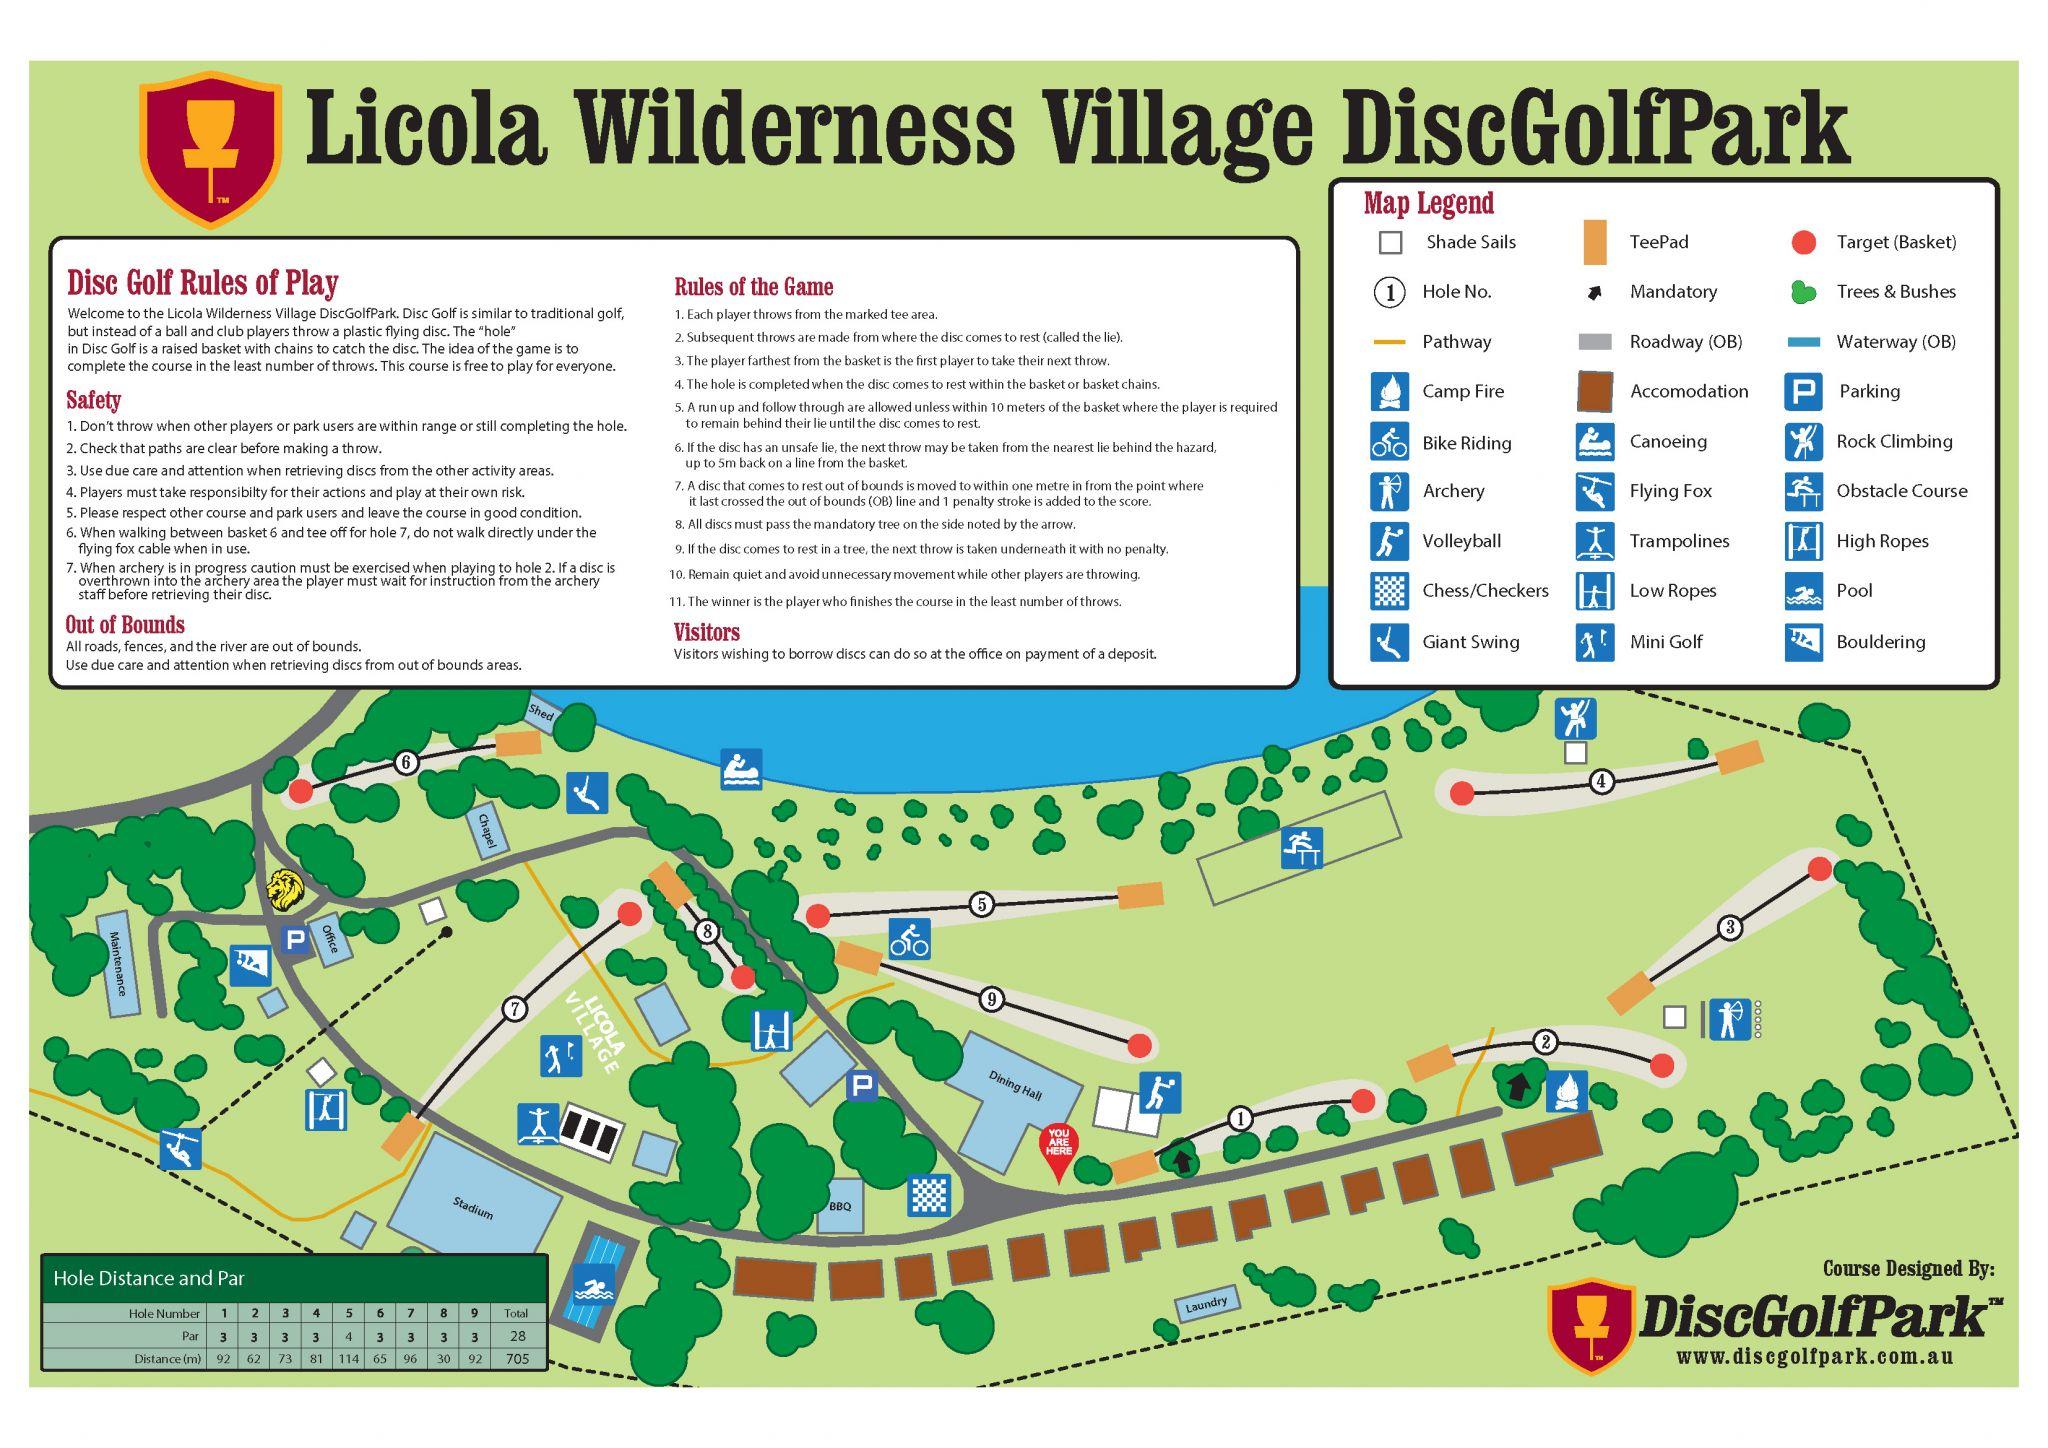 An image of licola wilderness village disc golf park